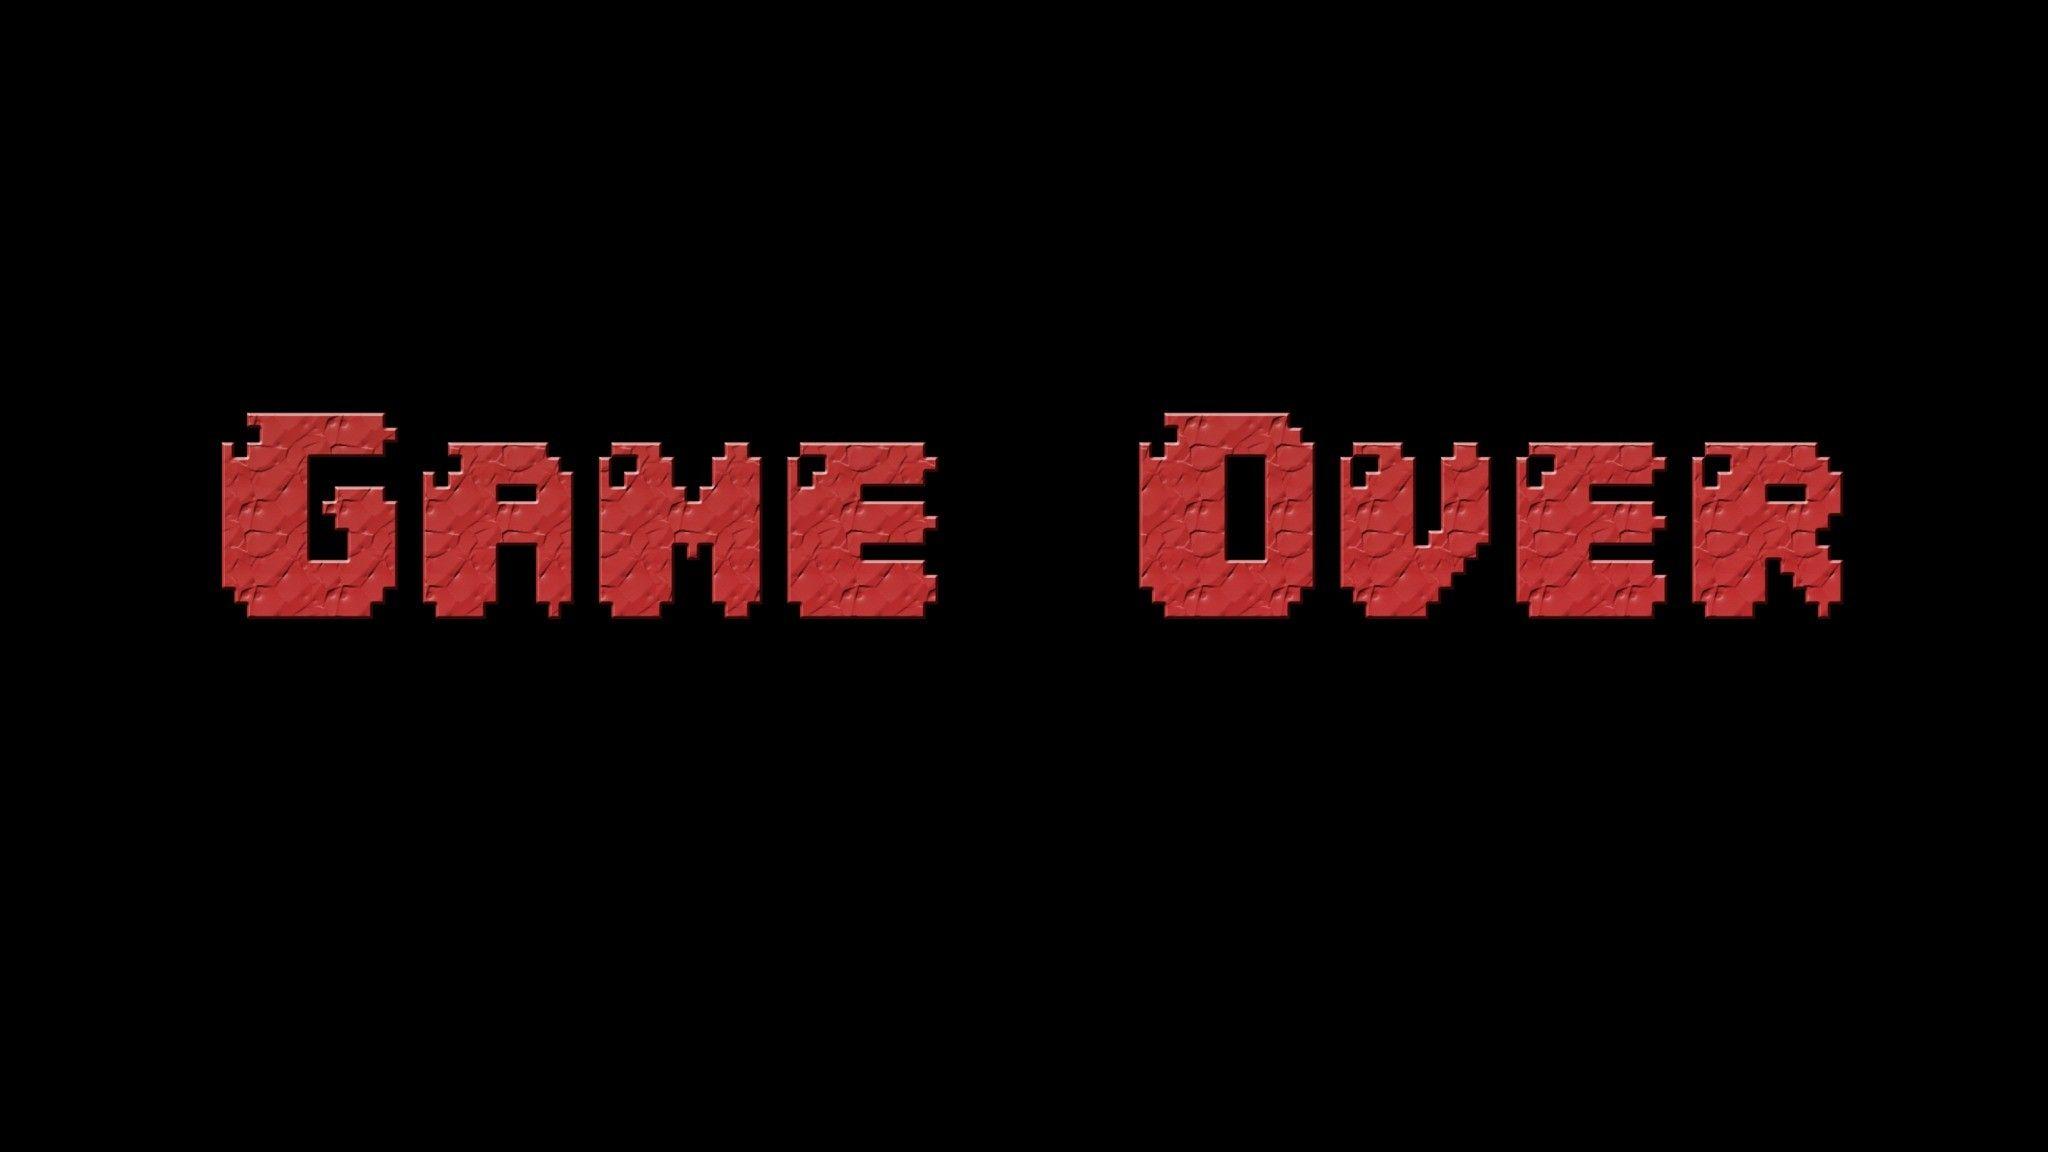 2048x1152 Download Deadpool Game Logo Hd 4k In 2019 Gaming